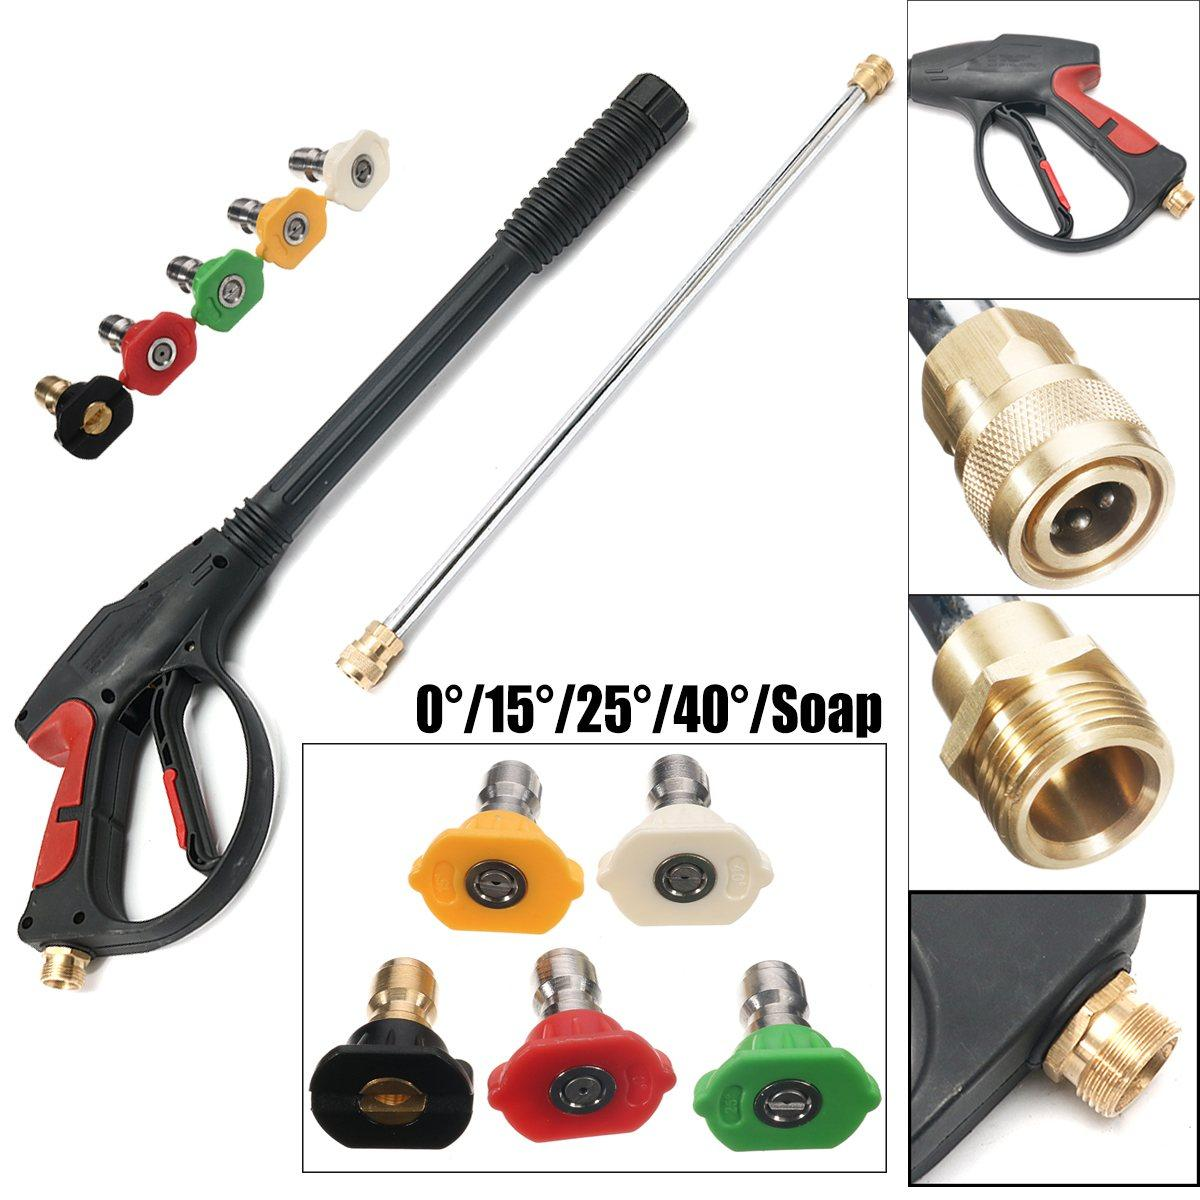 Freeshipping 1 set SPRAY GUN, WAND / LANCE5 스프레이 팁 Power Pressure Washer 워터 펌프 최대 3000 Psi